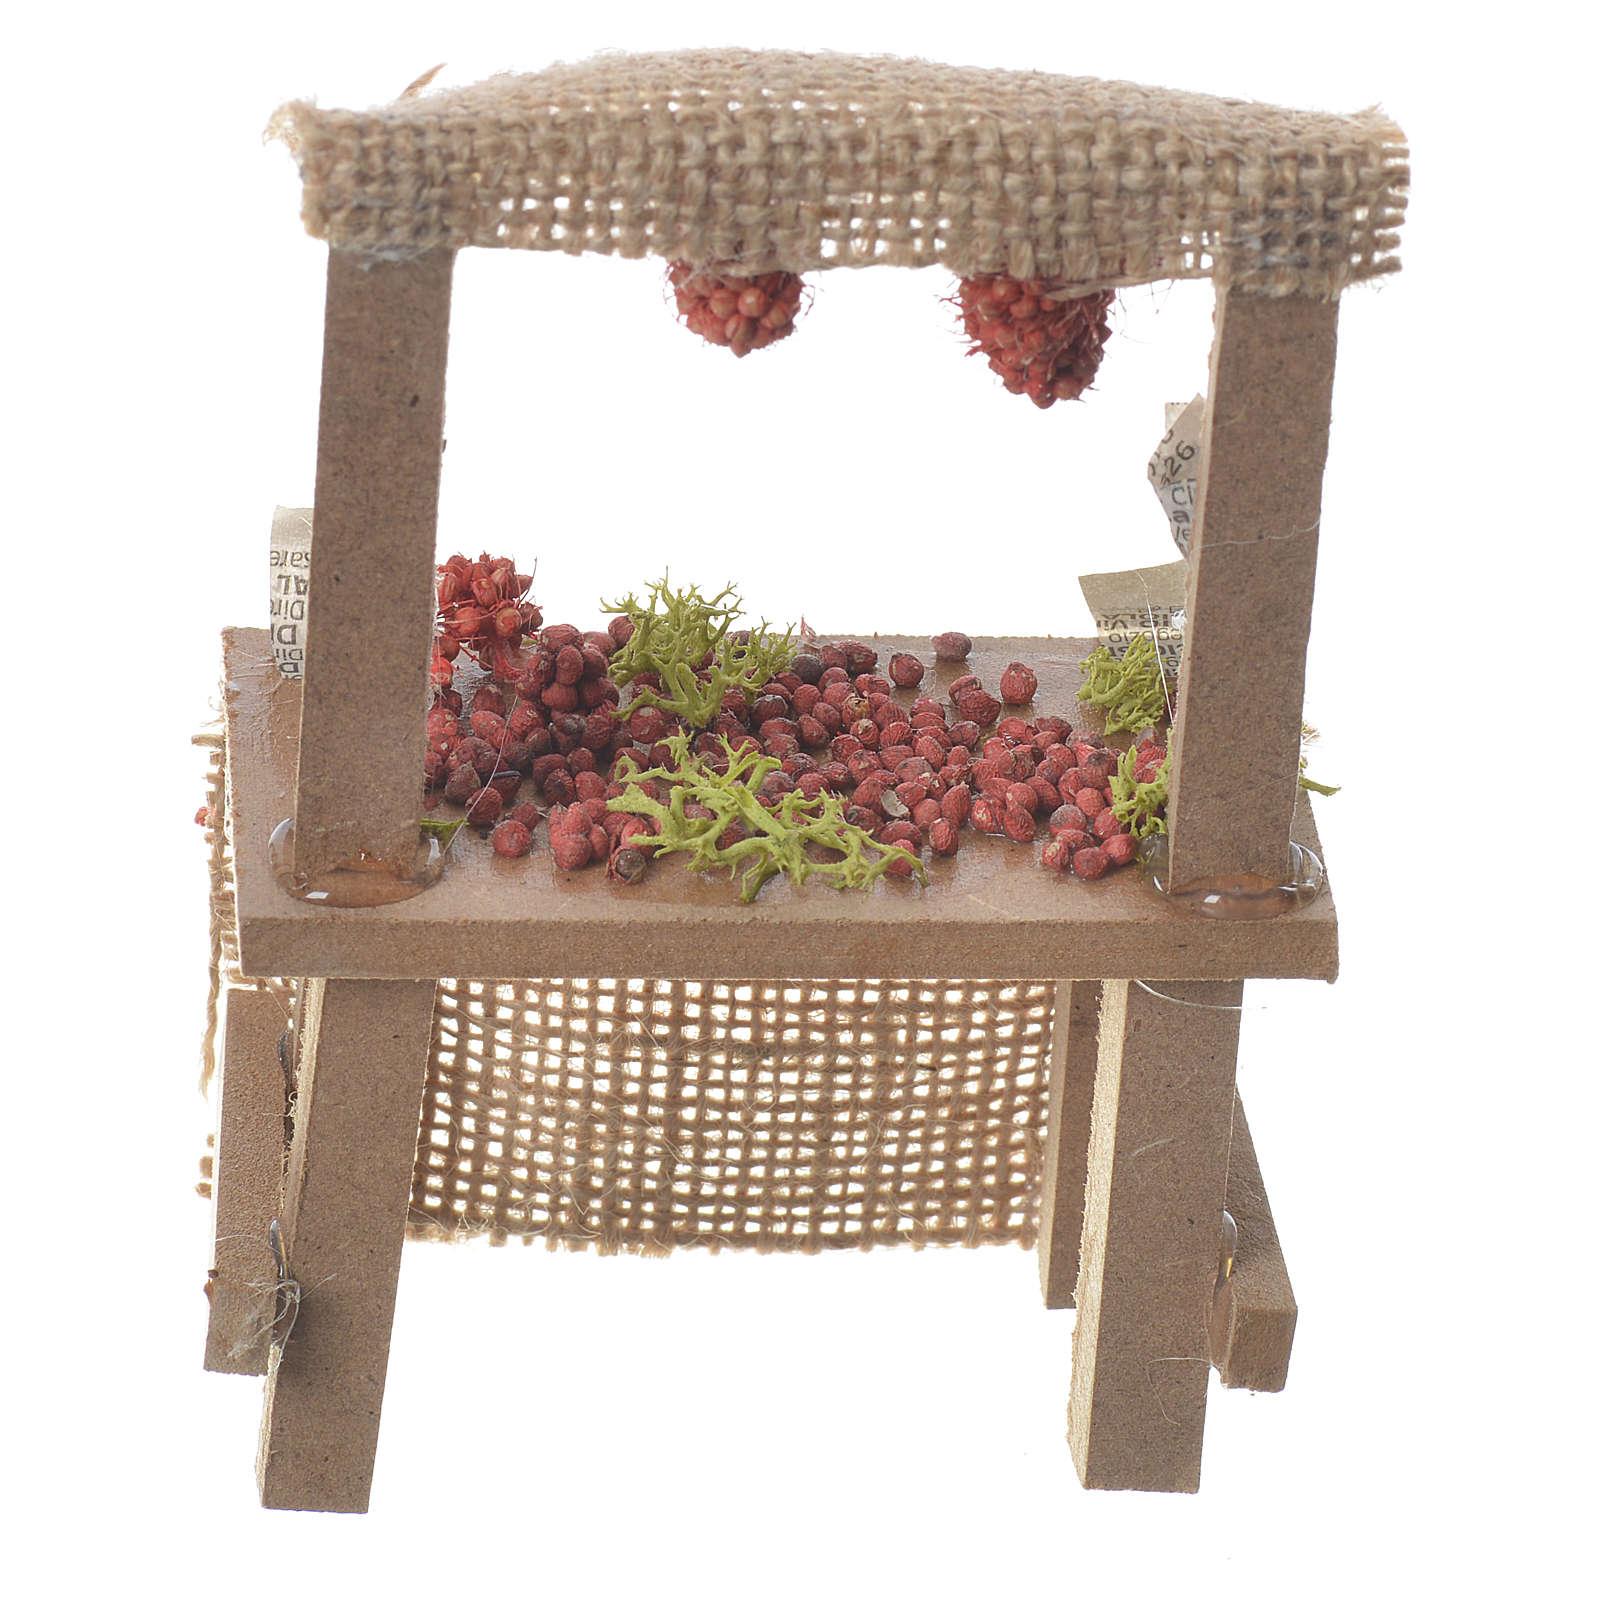 Banco frutta rossa presepe 10,5x7x4,5 cm 4